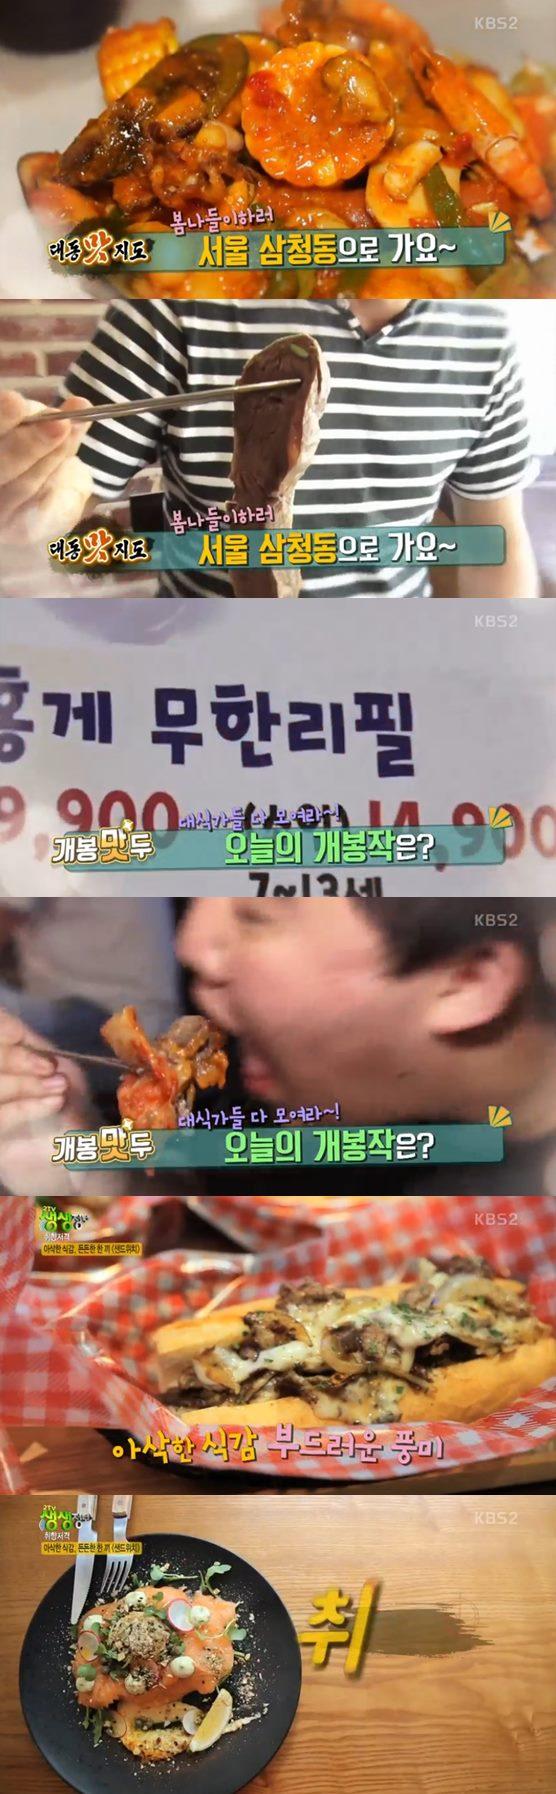 '2TV 생생정보' 소고기vs홍게 무한리필vs삼청동 맛집vs오픈·쿠바·한국식 반미 샌드위치 맛집